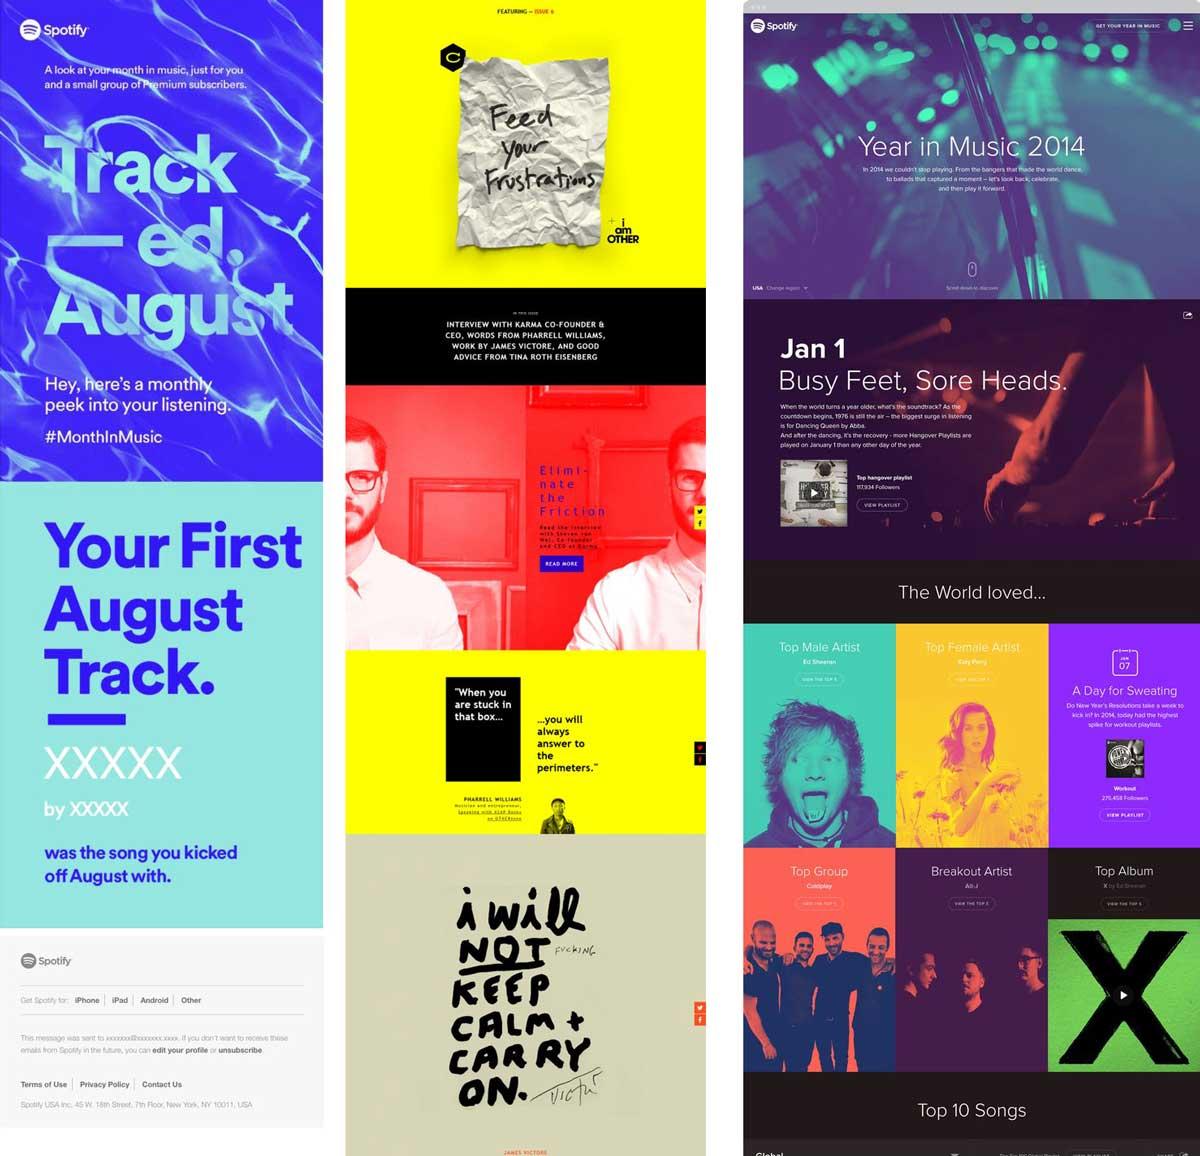 Colour Blocking & Email Design | APSIS Blog